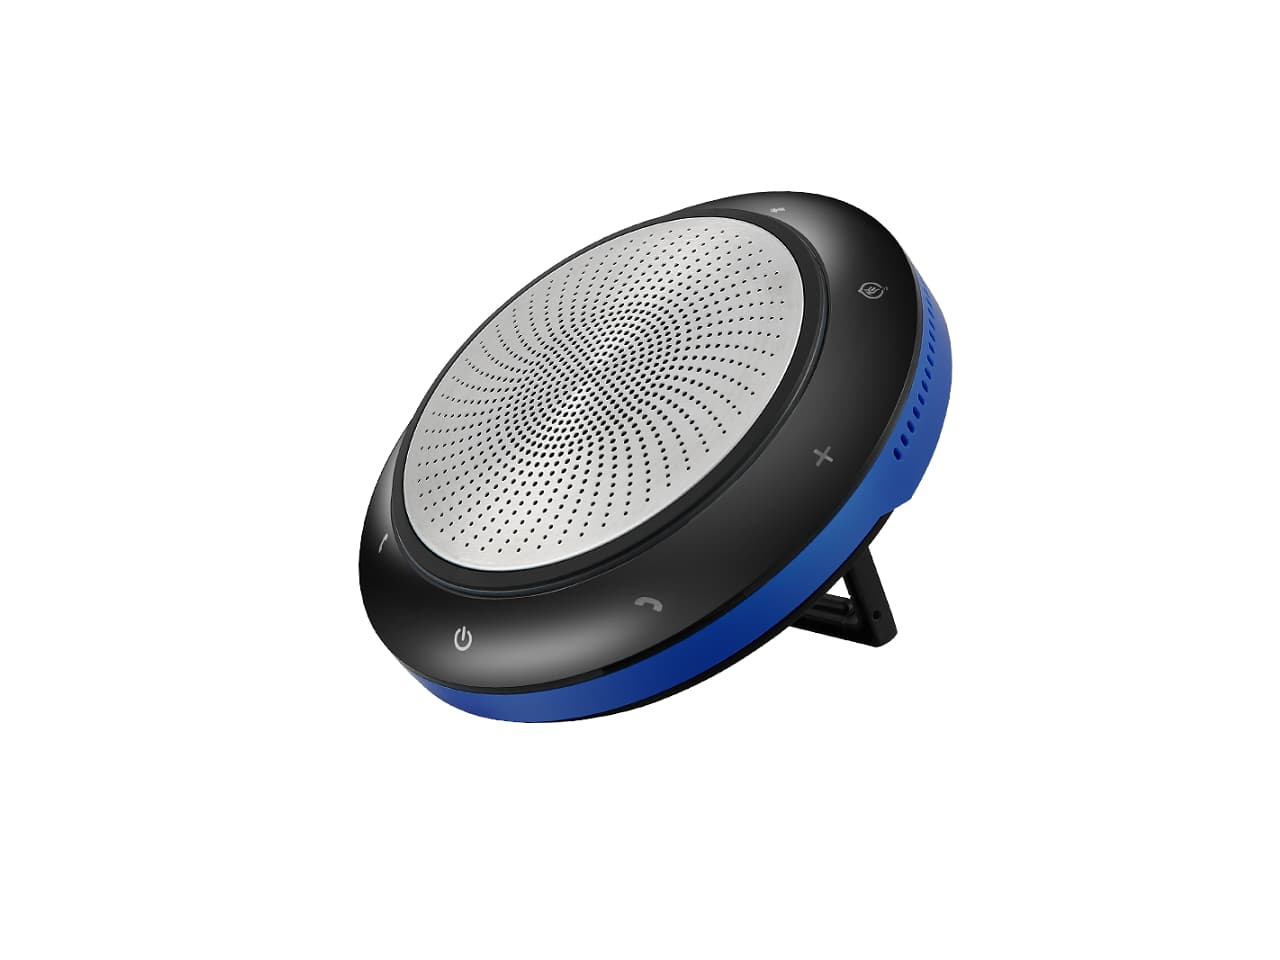 Hameco konferencia hangszoro,audiokonferencia eszköz